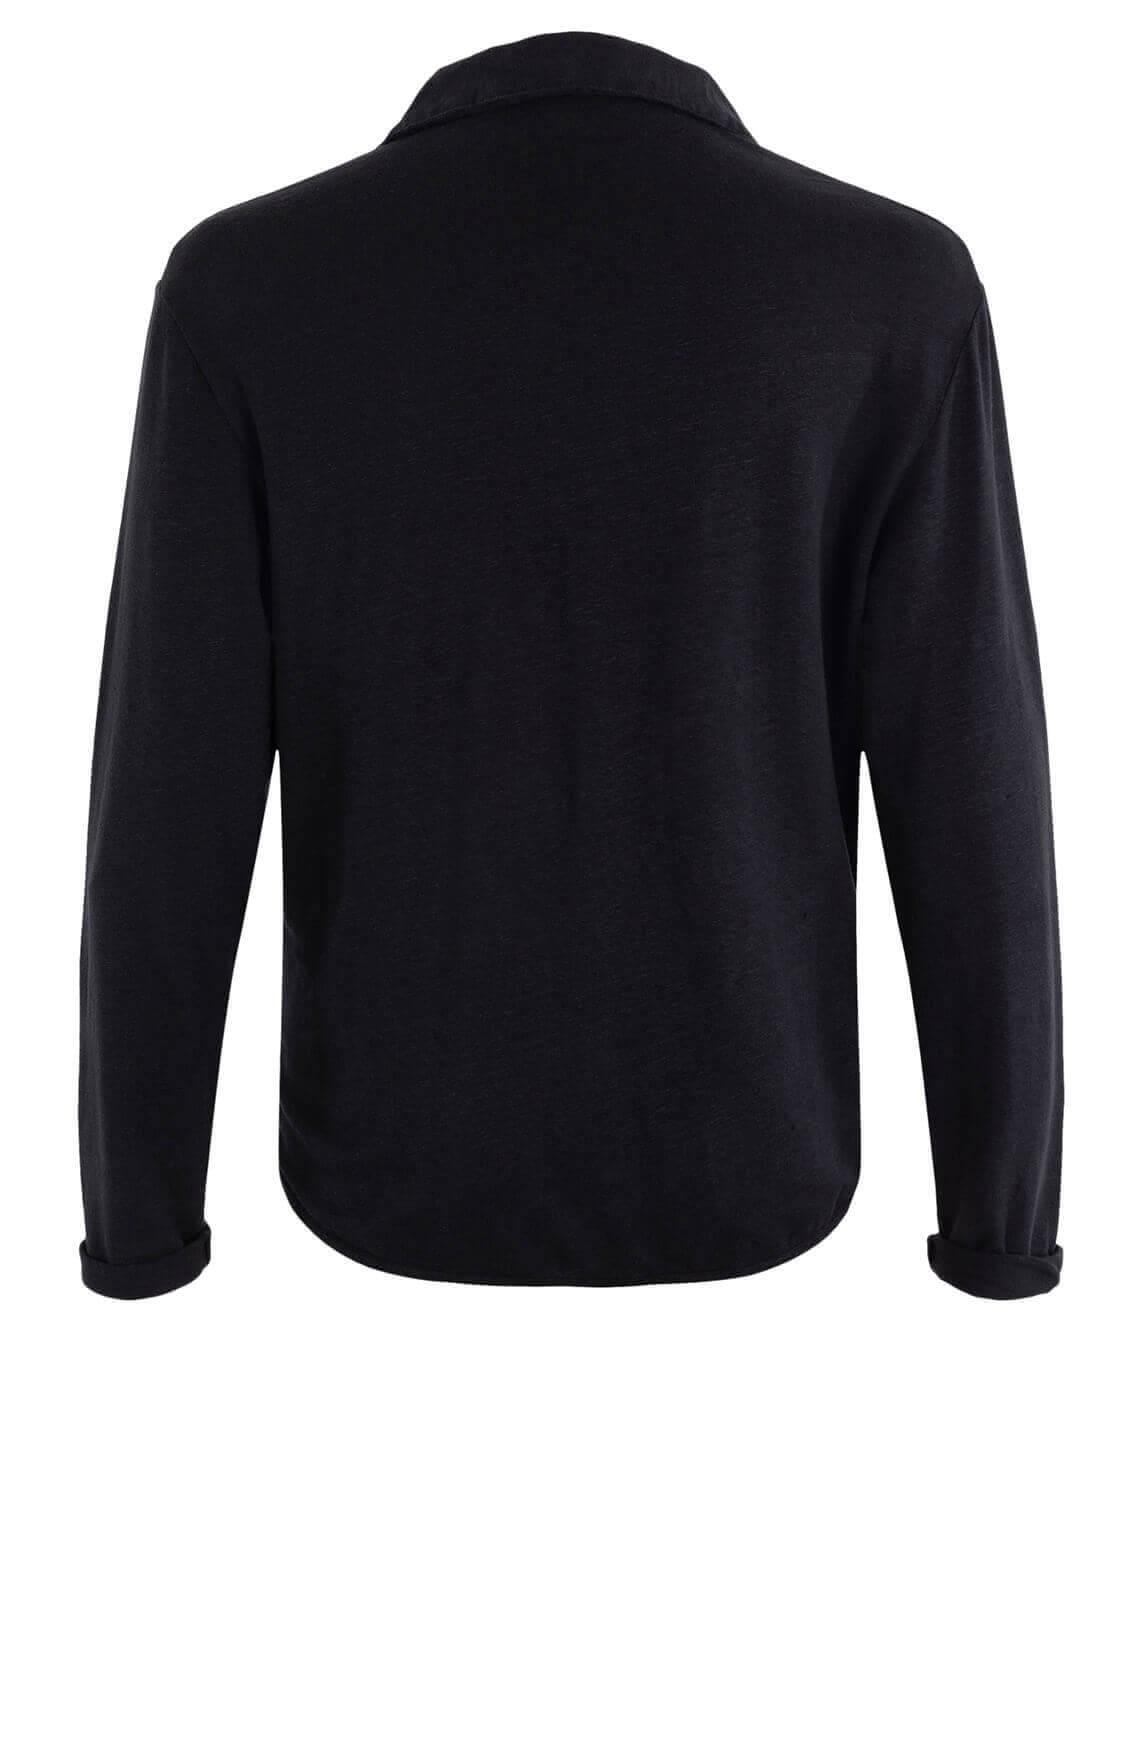 10 Days Dames Polo shirt Zwart